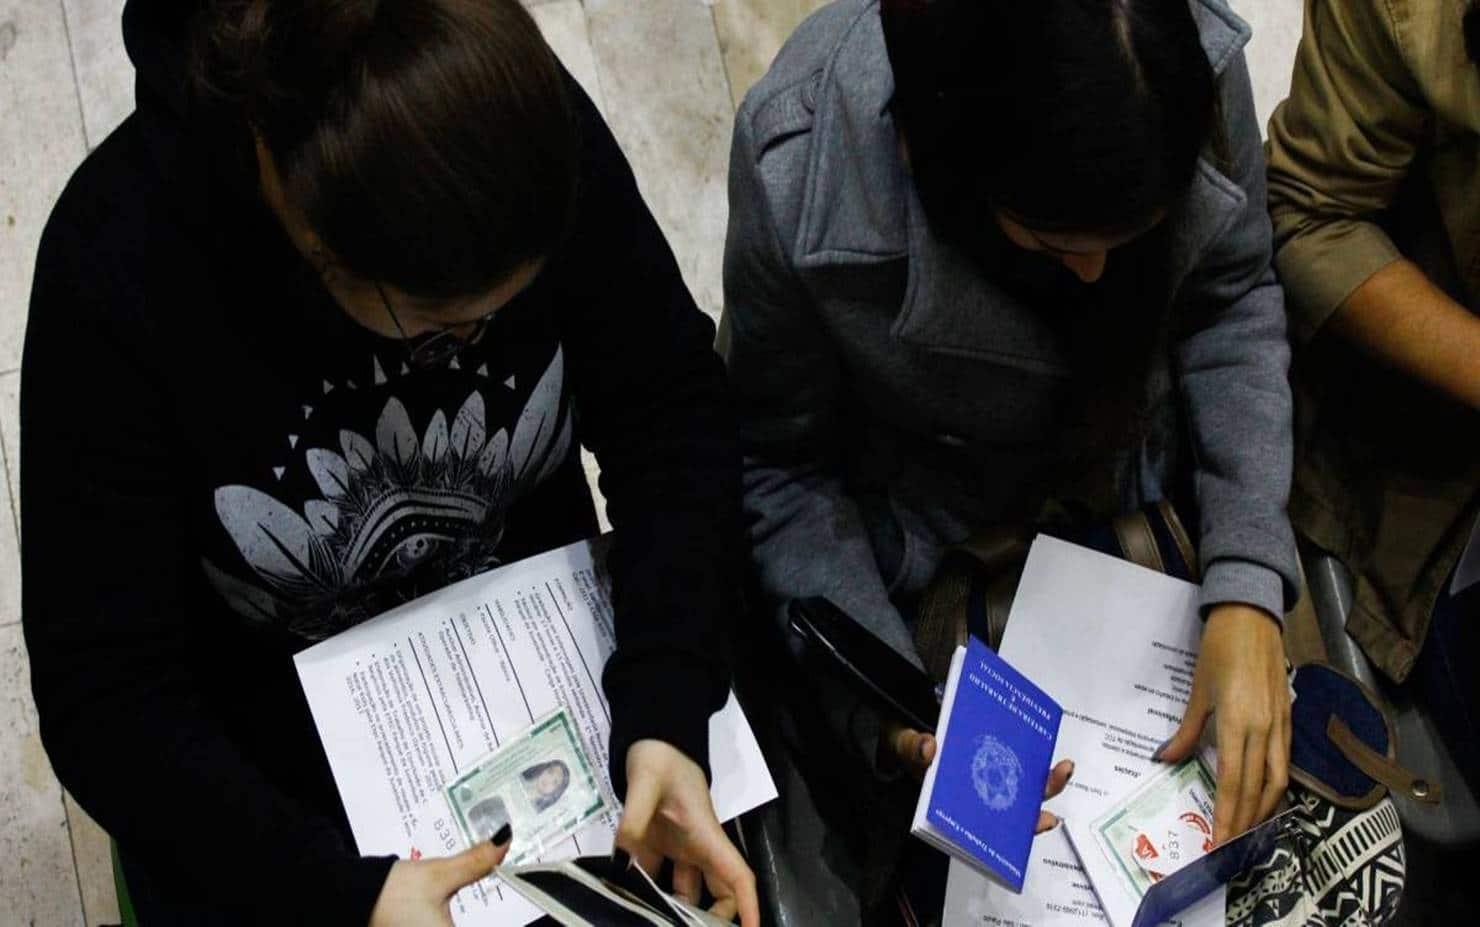 Nova PEC derruba valor do abono salarial PIS/Pasep para menos de um salario mínimo